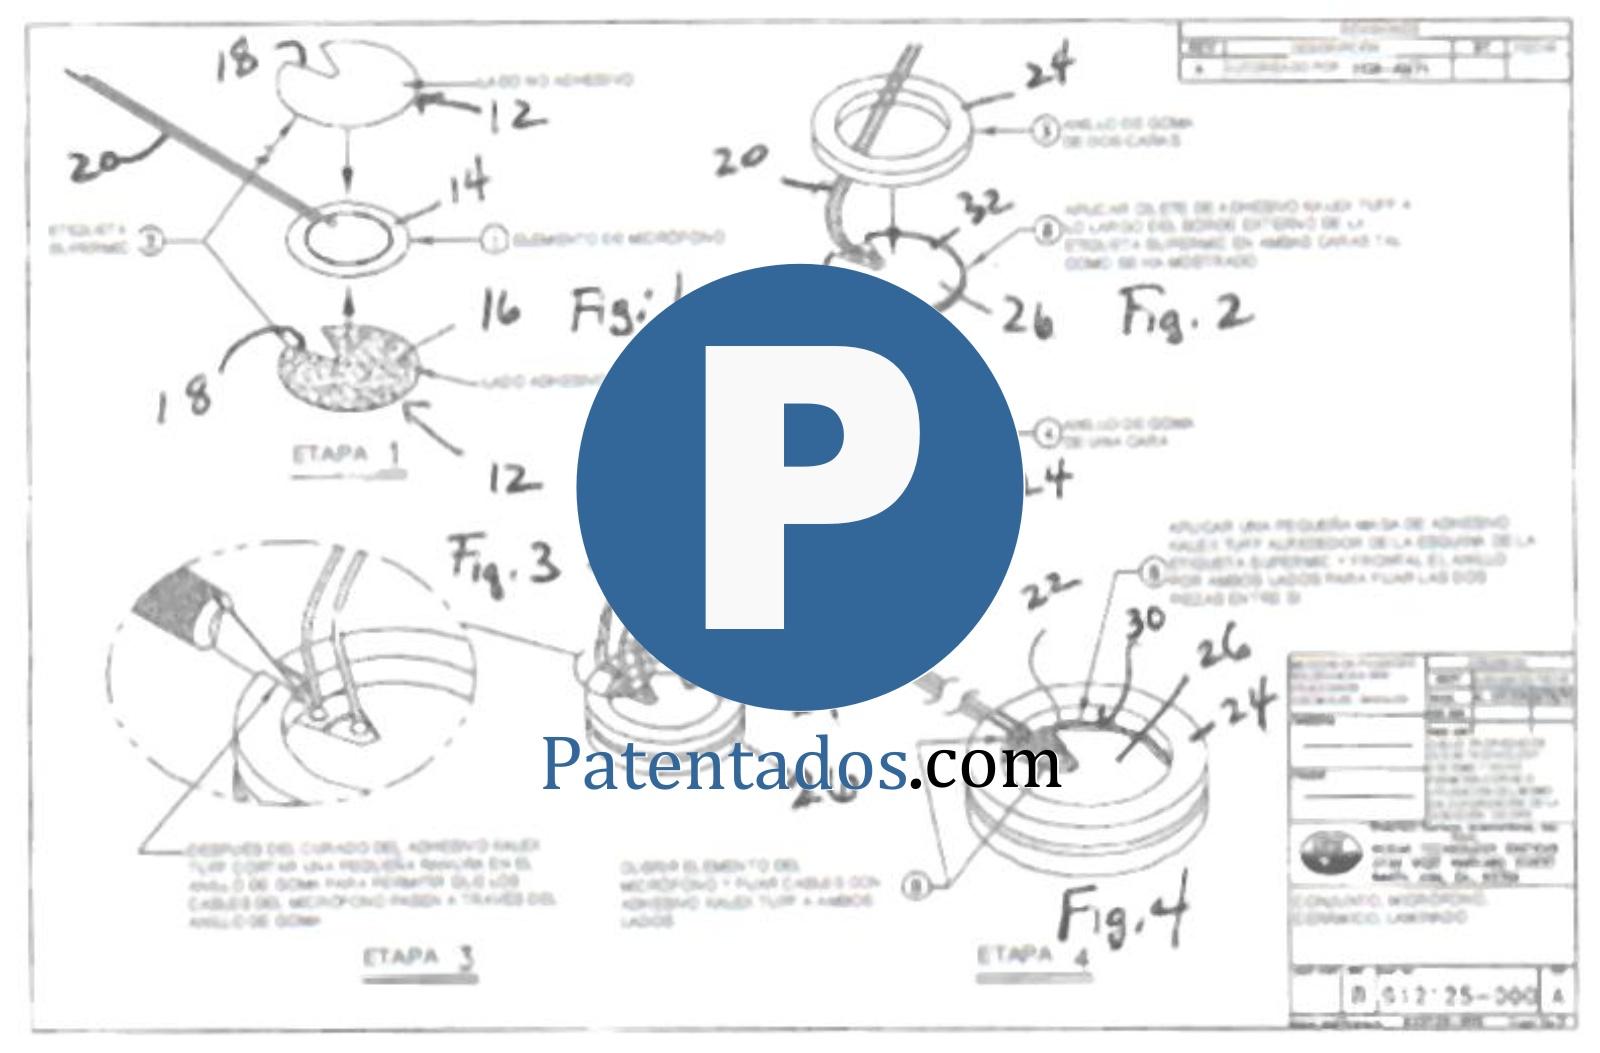 CABINA-TALLER Y CENTRO DE COMUNICACIONES,MOVIL. : Patentados.com